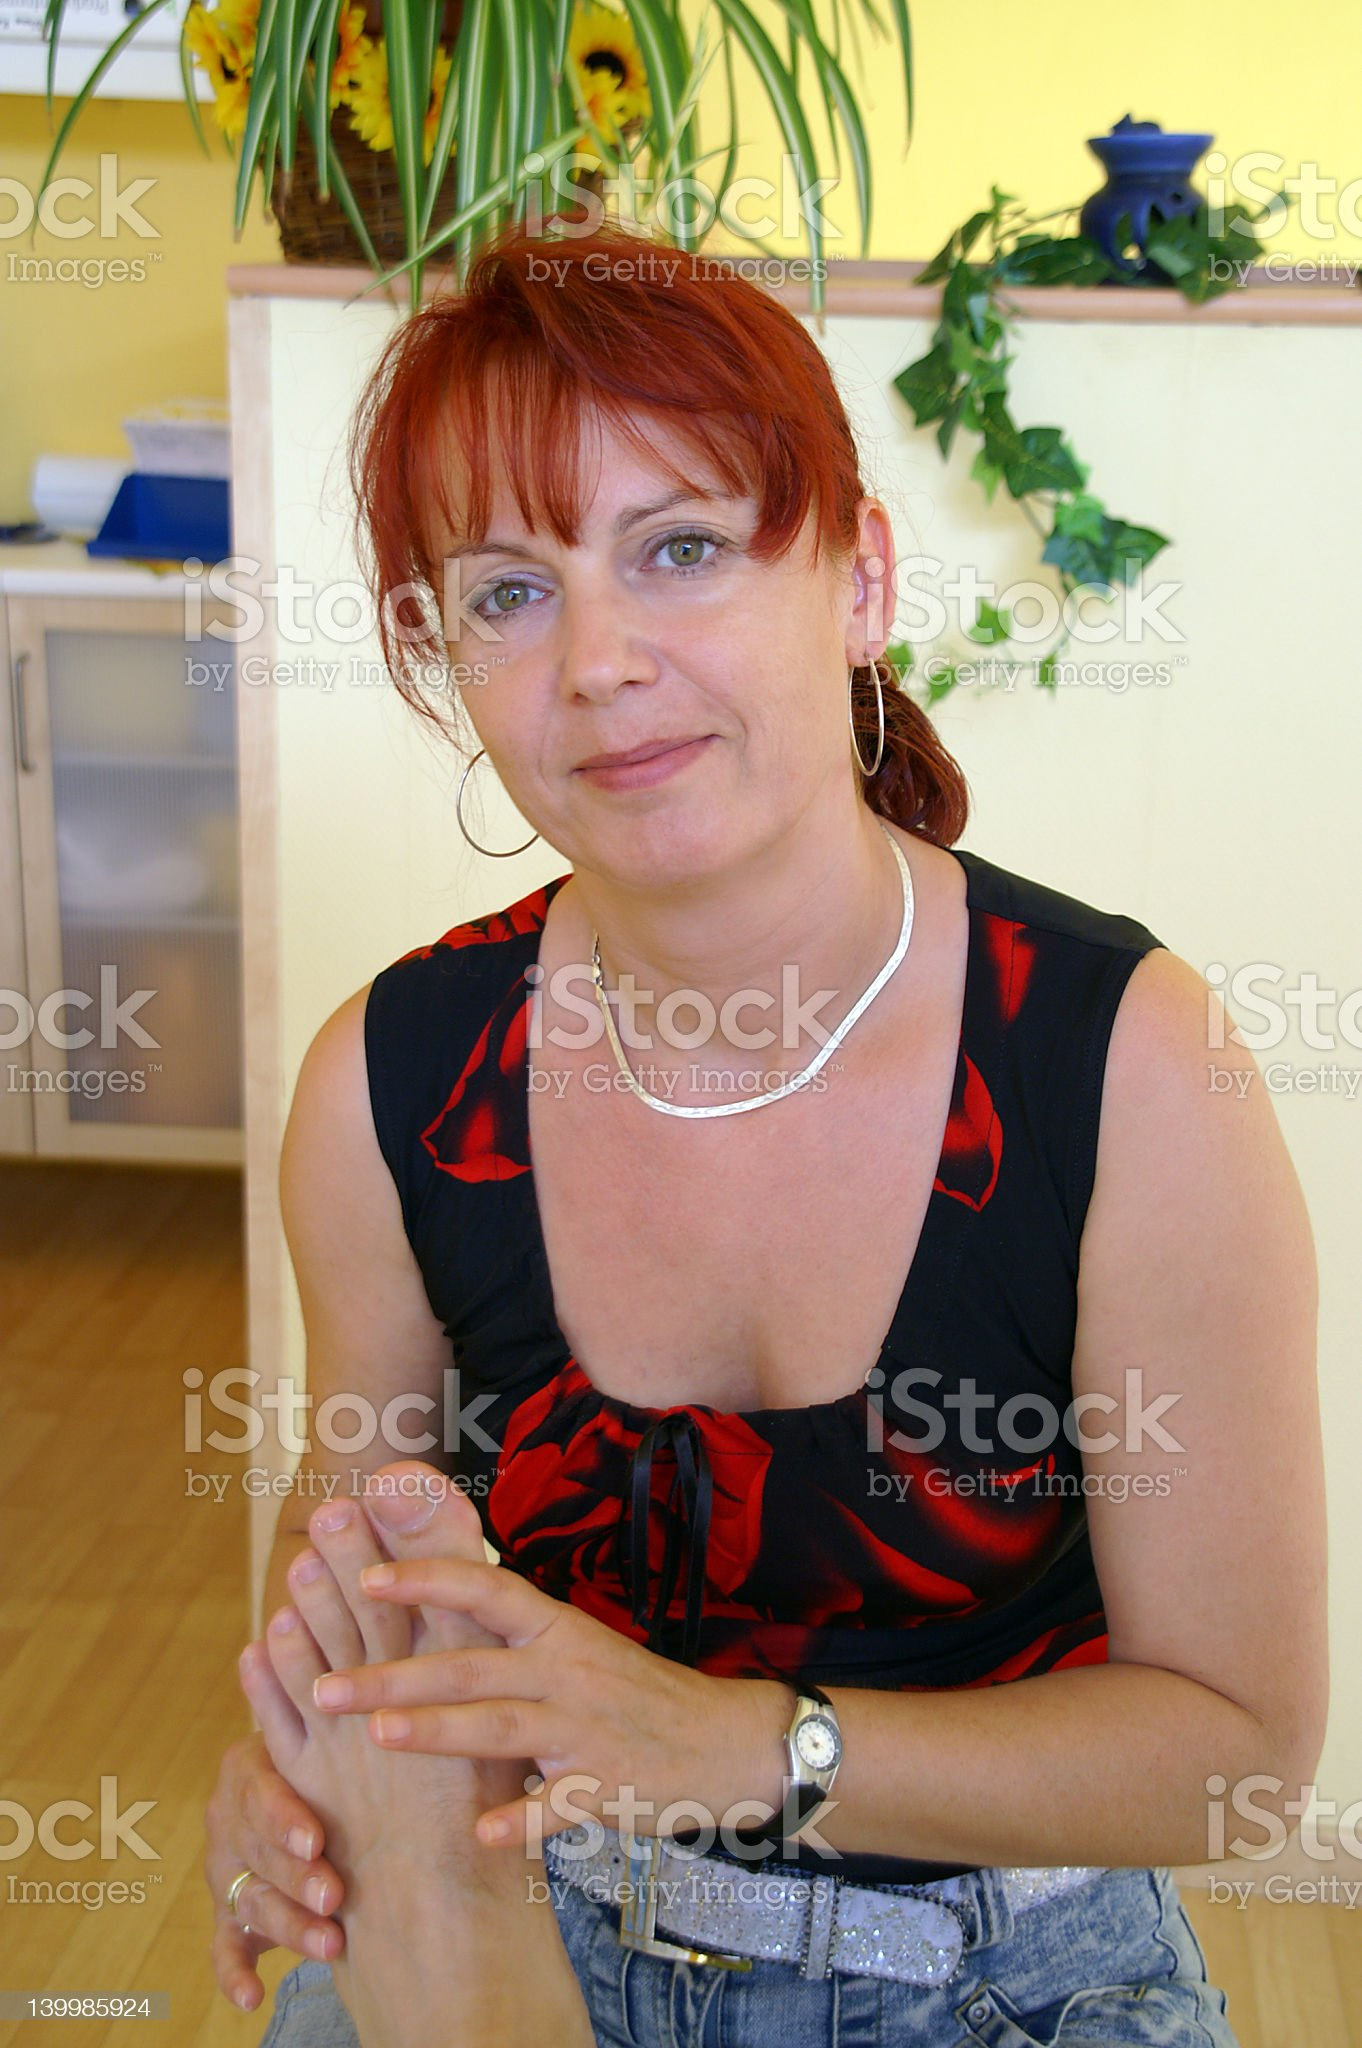 podiatrist royalty-free stock photo